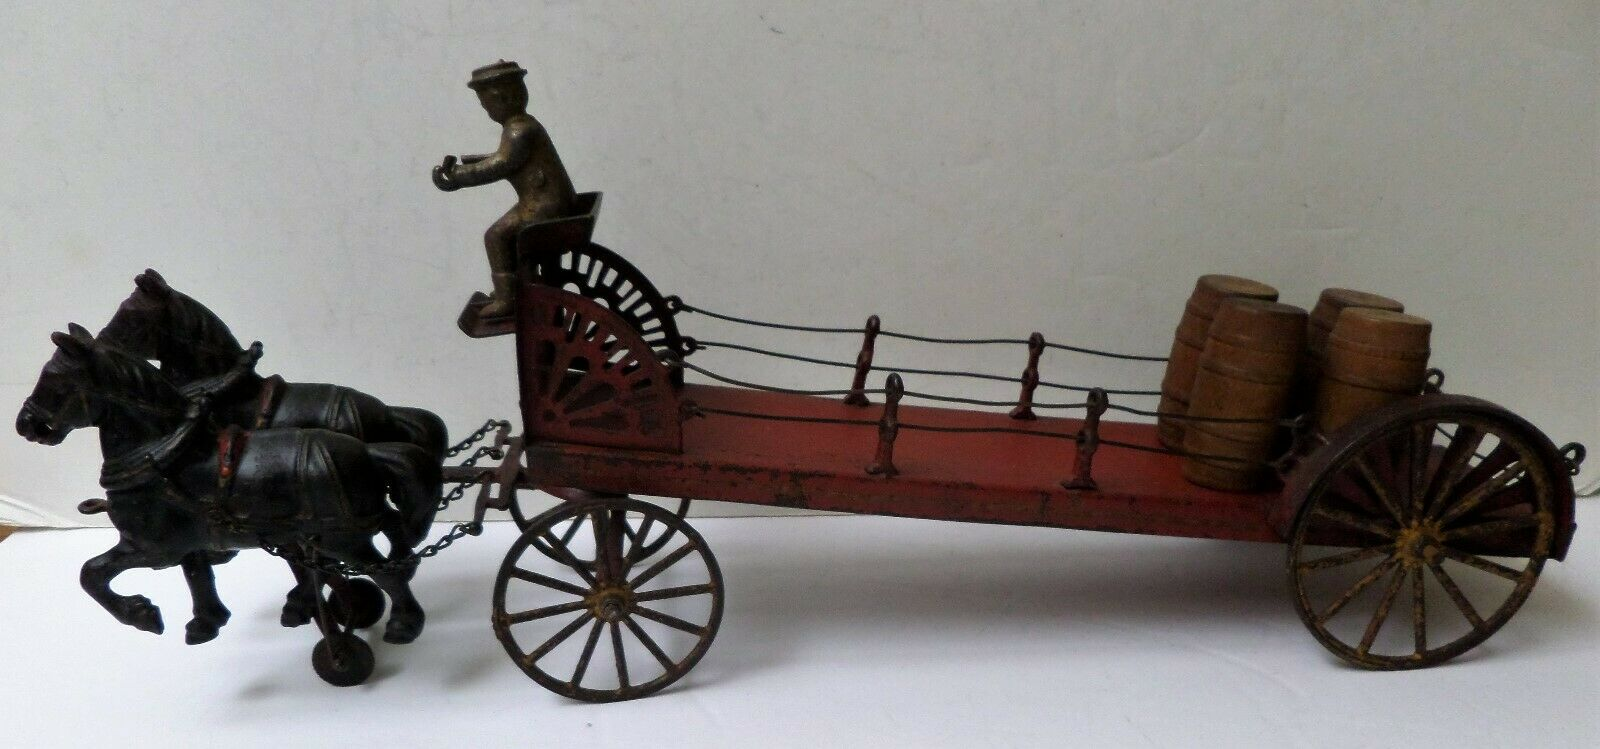 Raro Hubley Wilkins de hierro fundido & Granja caballo Dibujado de estaño Pala De Arrastre Cochero Vagón